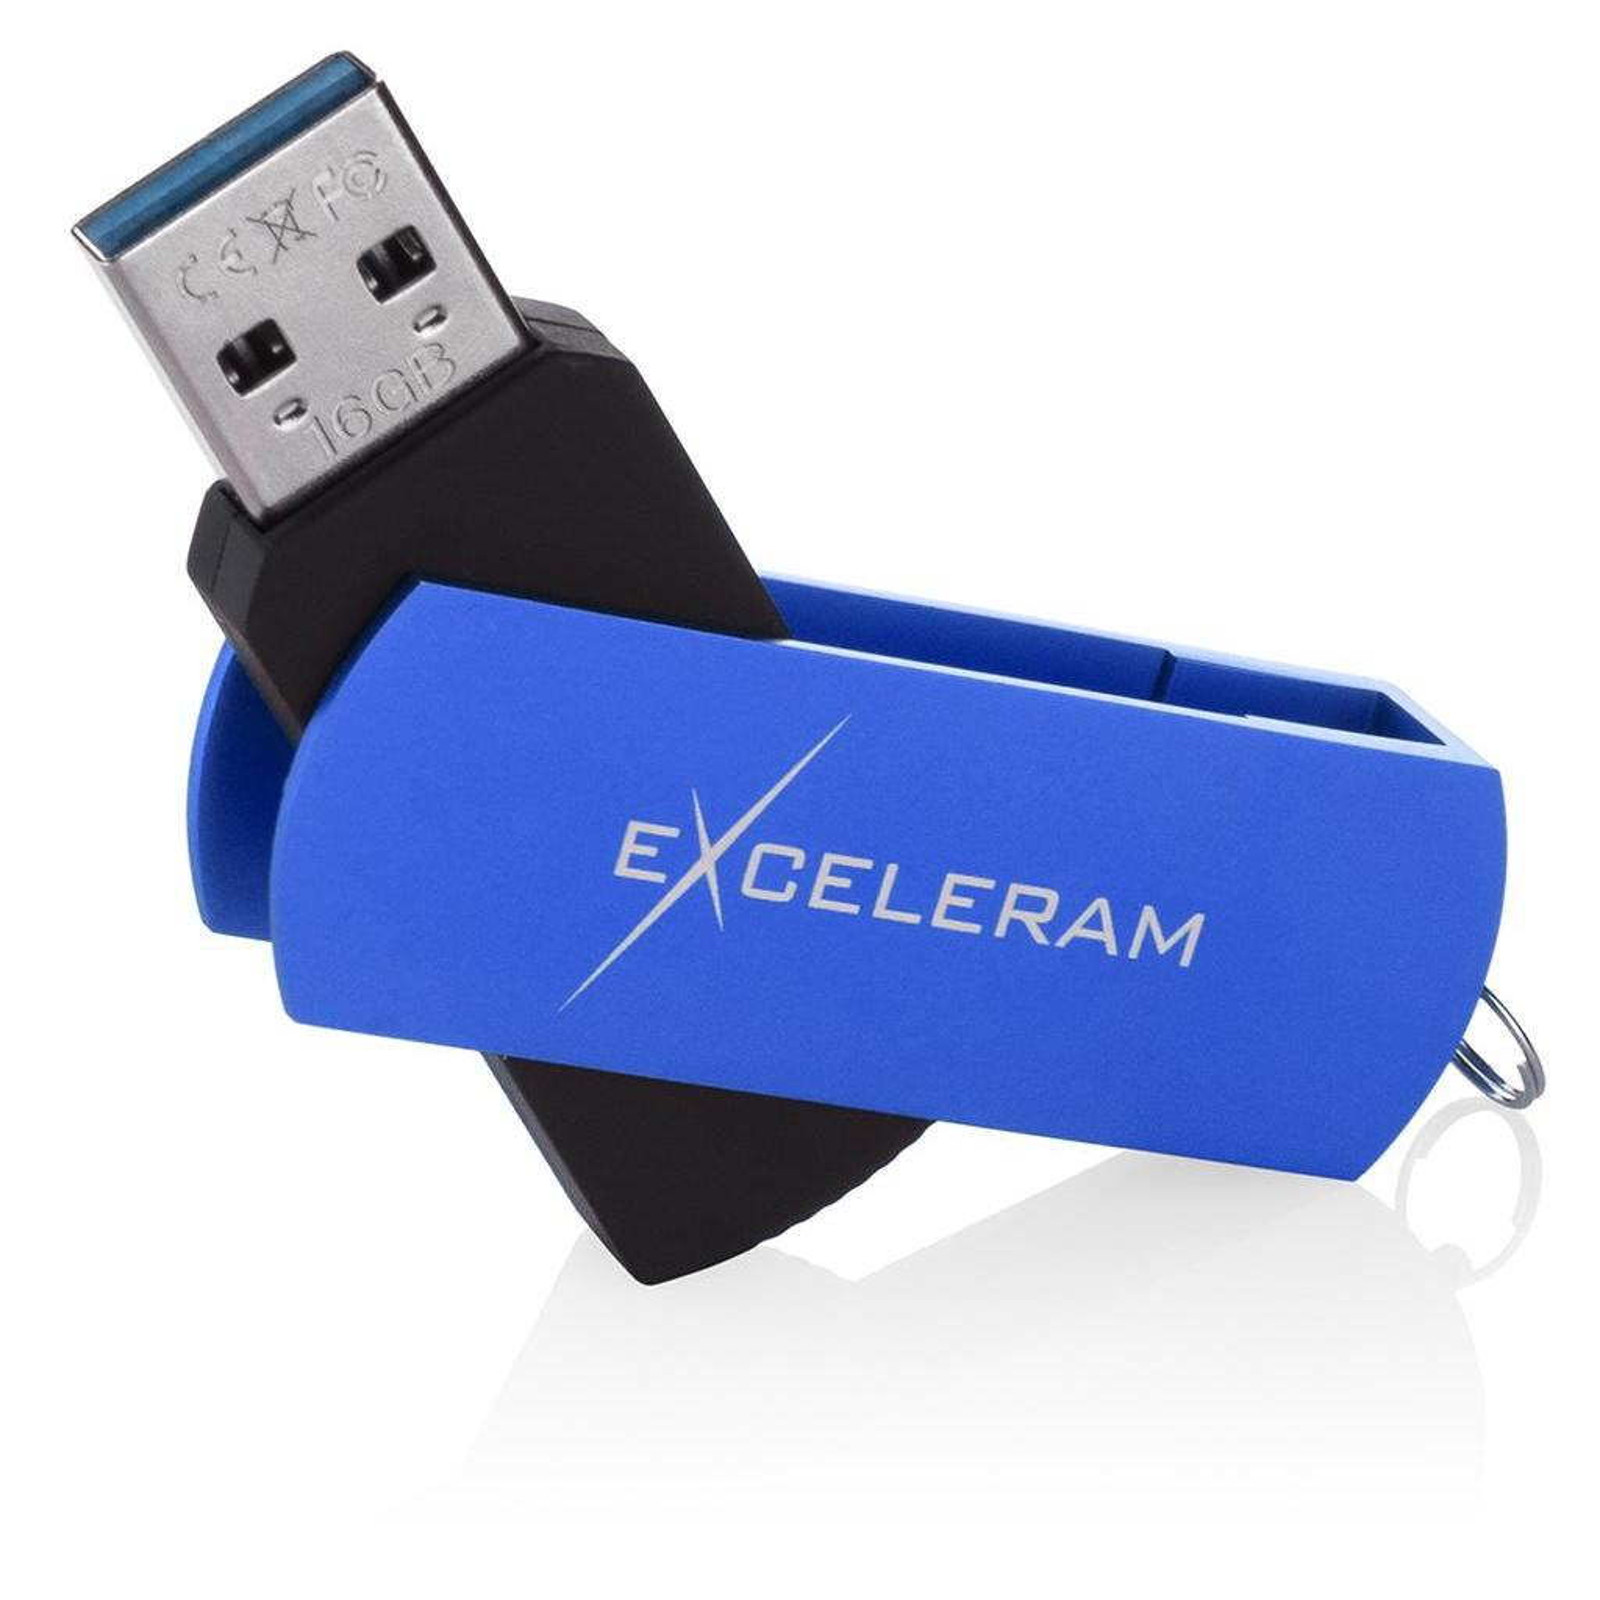 USB флеш накопитель eXceleram 32GB P2 Series White/Black USB 3.1 Gen 1 (EXP2U3WHB32) изображение 3